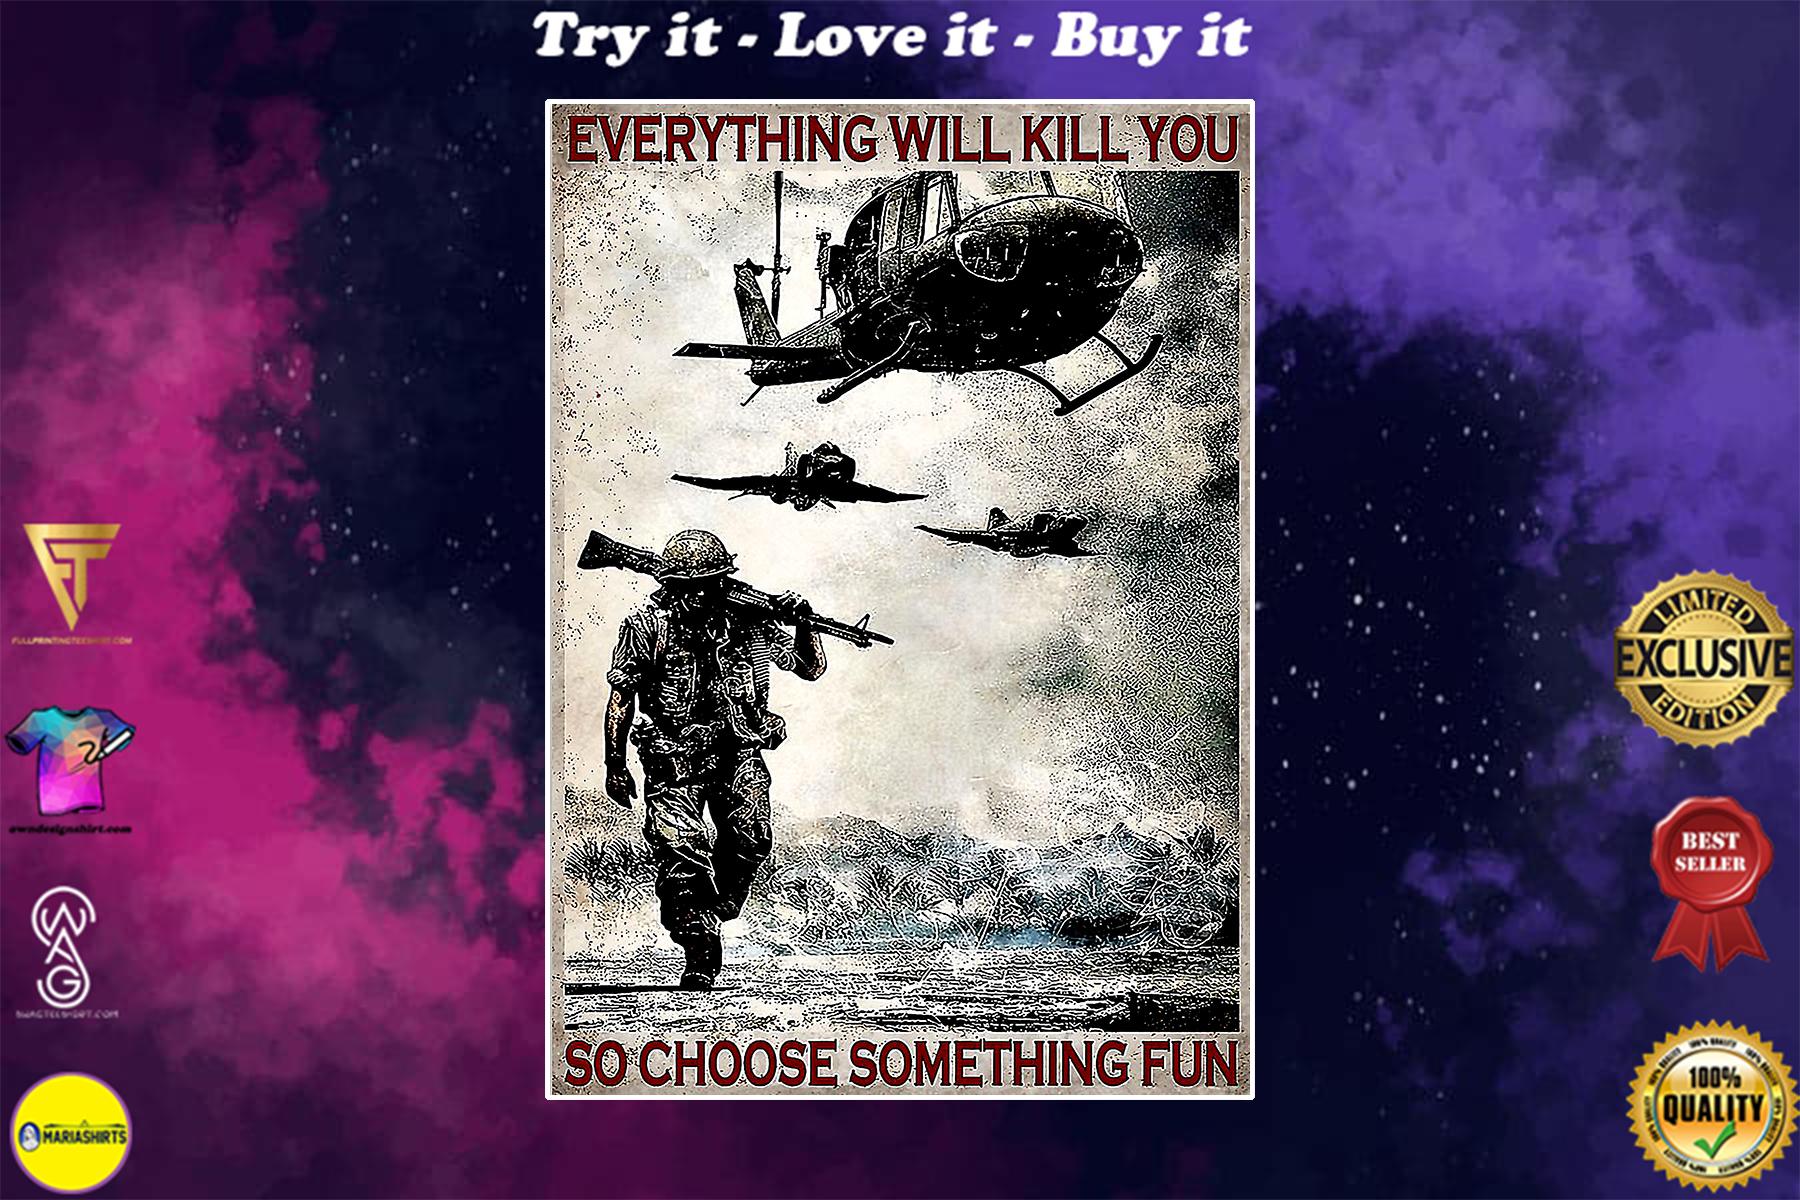 everything will kill you so choose something fun veteran vintage poster